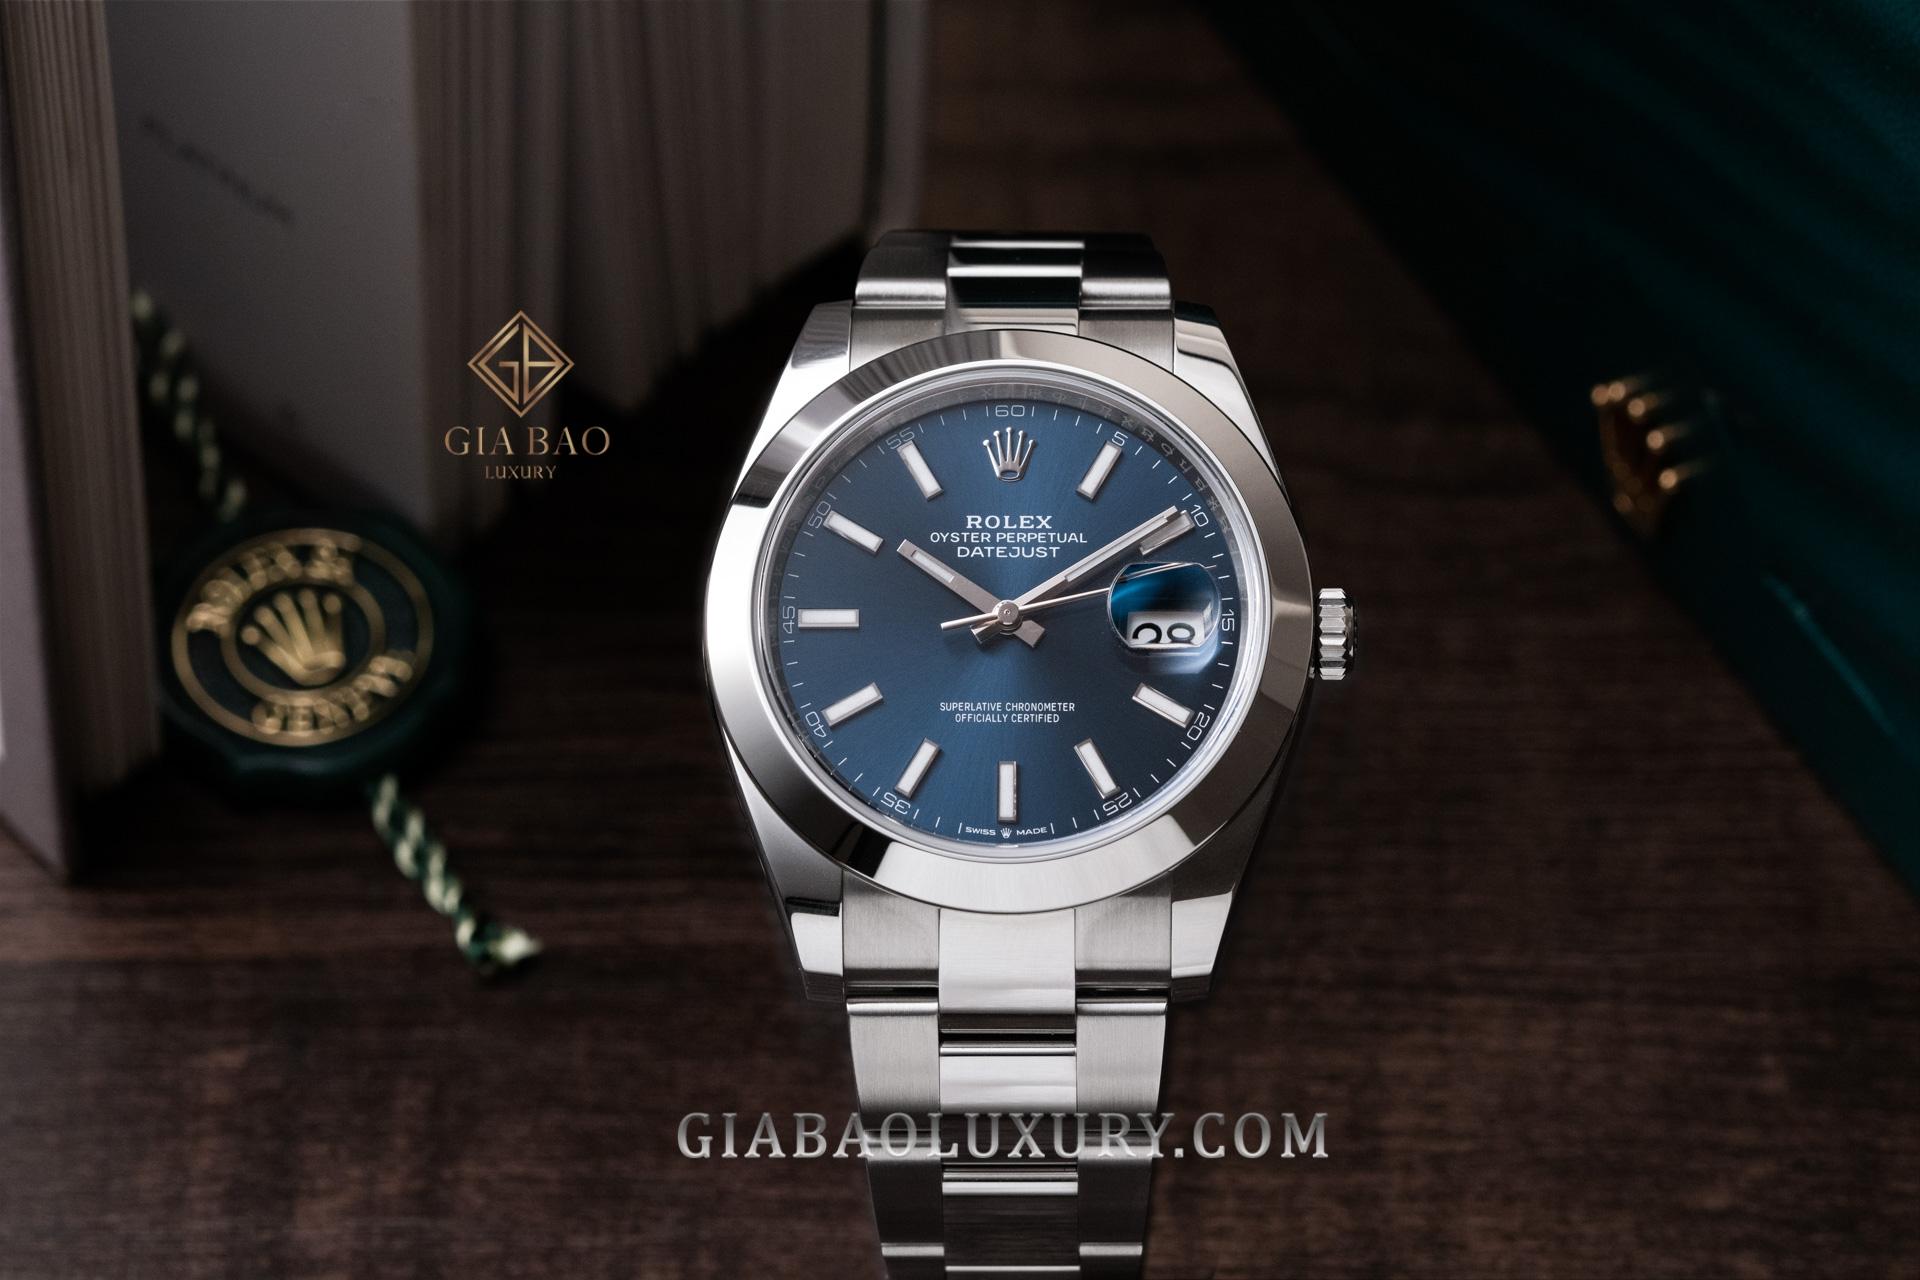 Đồng Hồ Rolex Datejust 41 126300 Mặt Số Xanh Dây Đeo Oyster